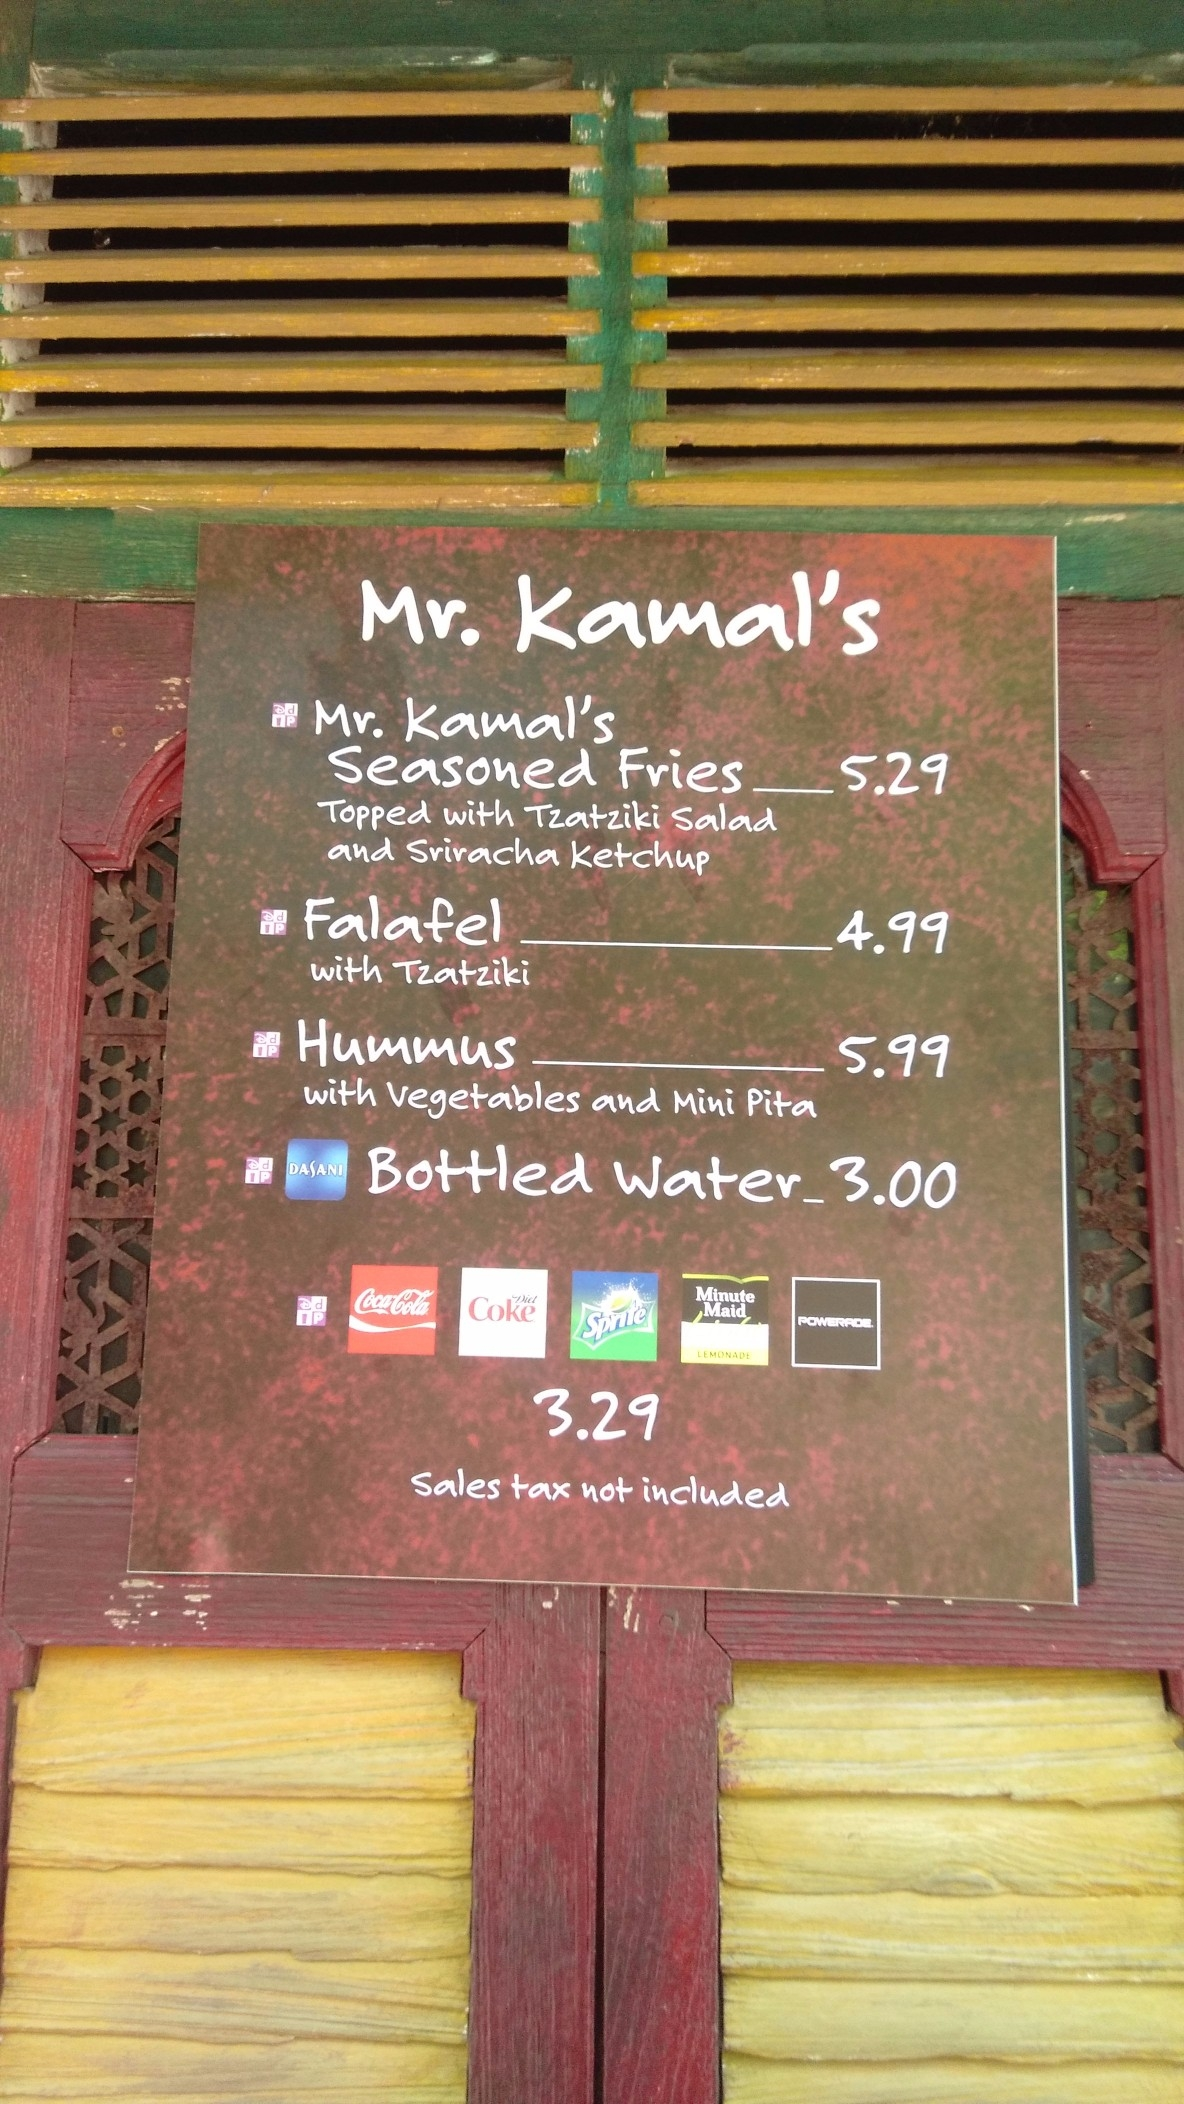 harambe food market snack creditsa nimal kingdom (1)